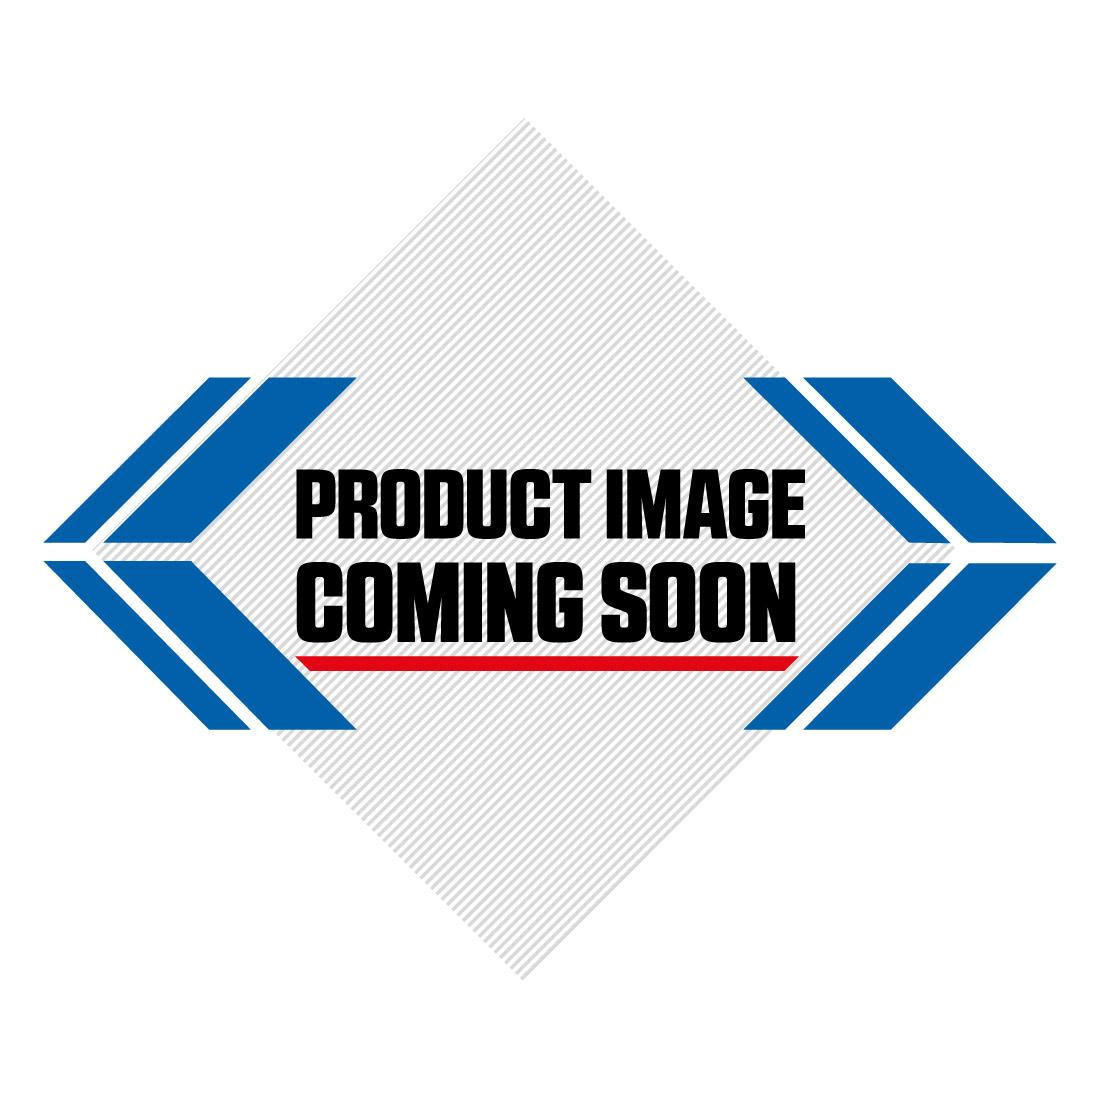 UFO Suzuki Plastic Kit RMZ 250 (2019) RMZ 450 (18-19) OEM Factory Image-0